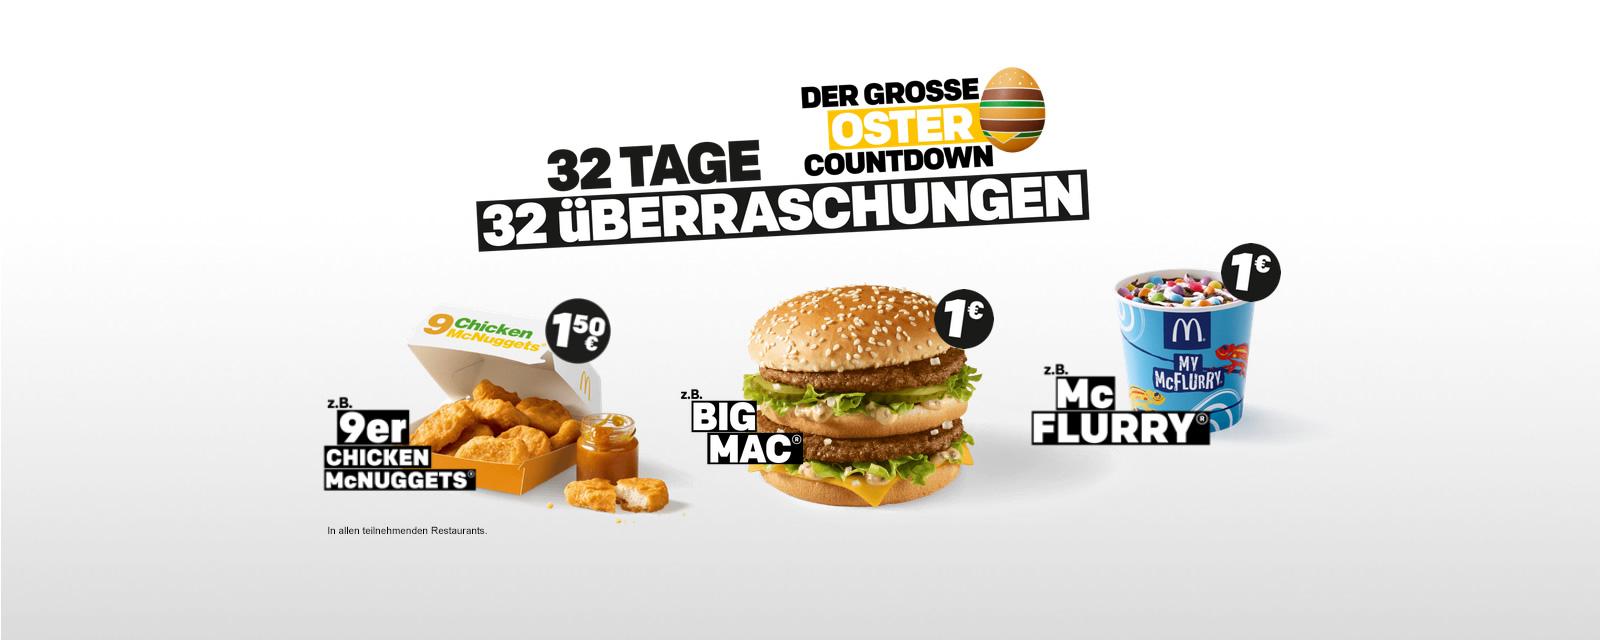 Der Große Oster Countdown